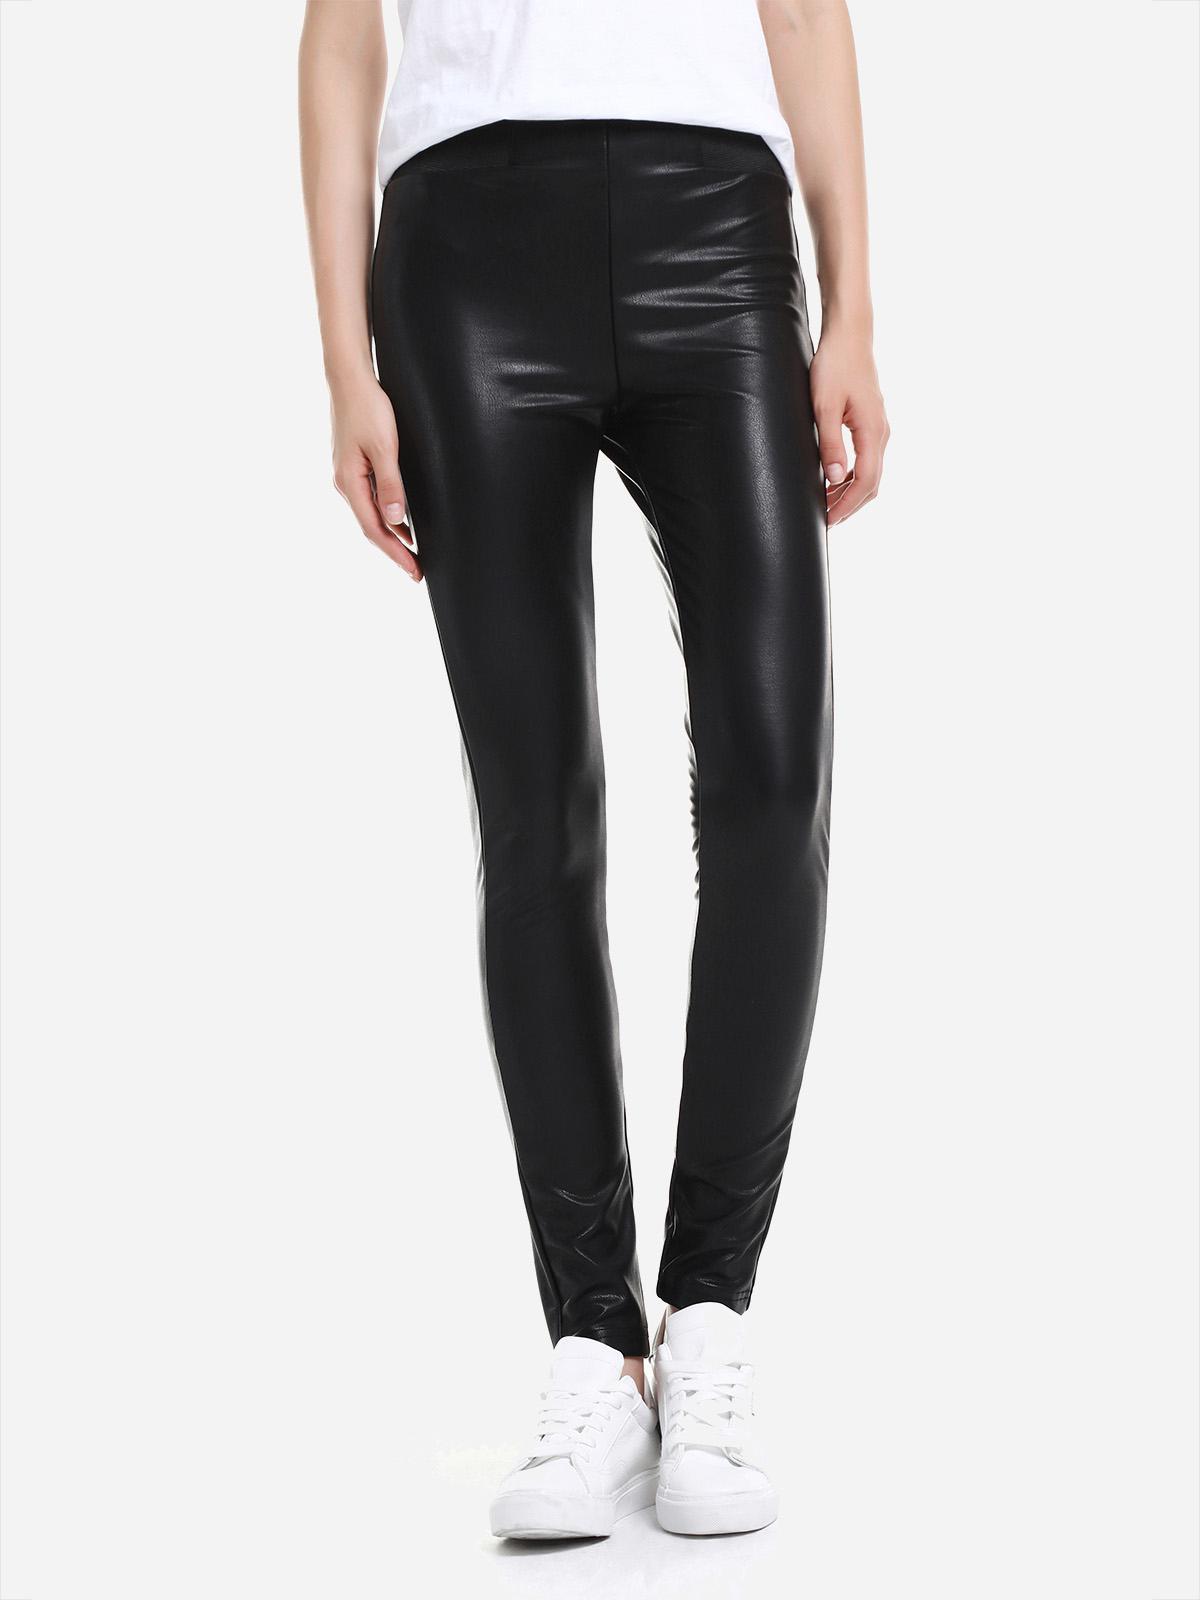 ZAN.STYLE Leather Leggings with Elasticized Waist